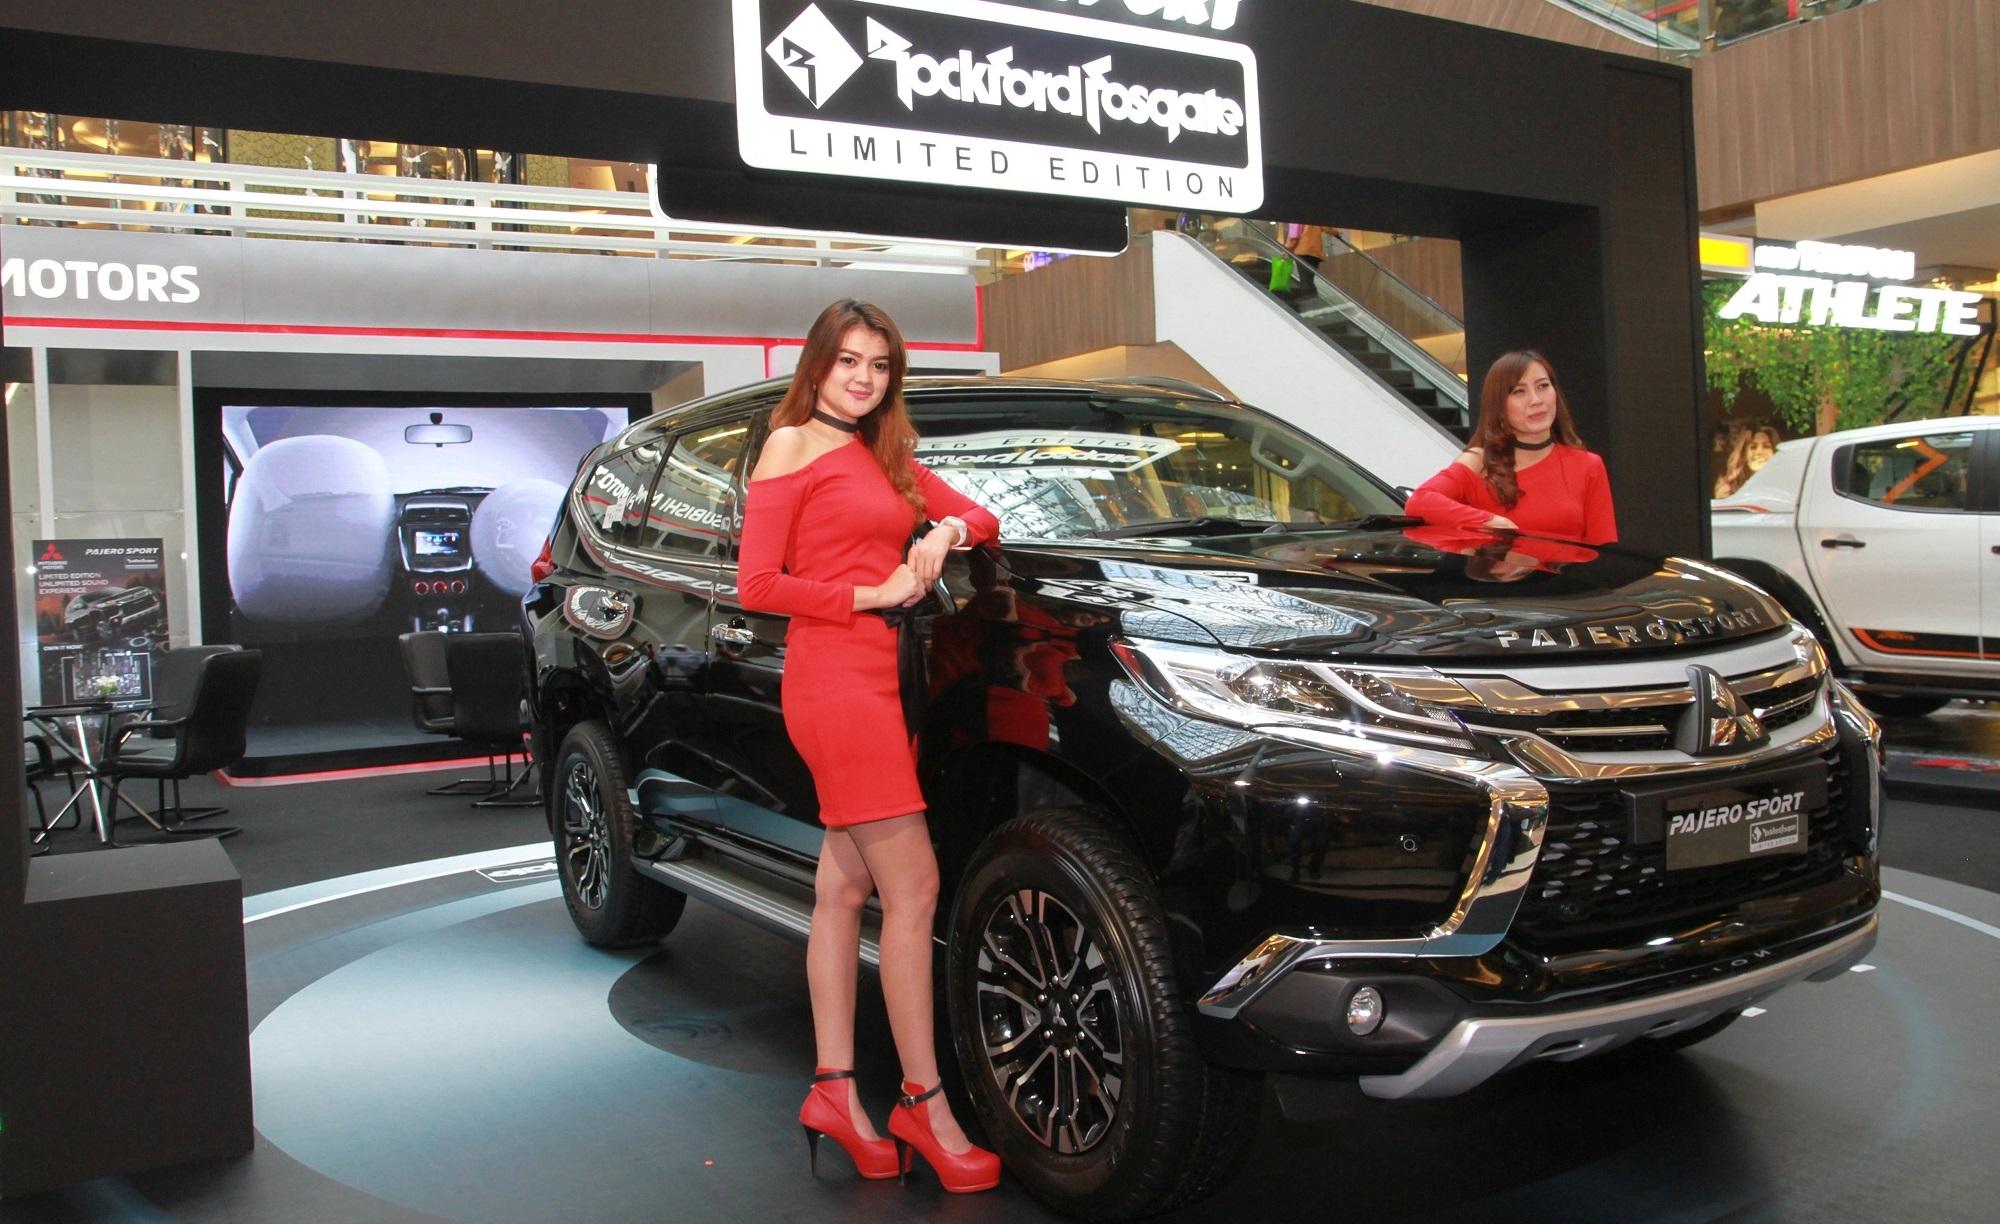 Mitsubishi Pajero Sport Rockford Fosgate  2020